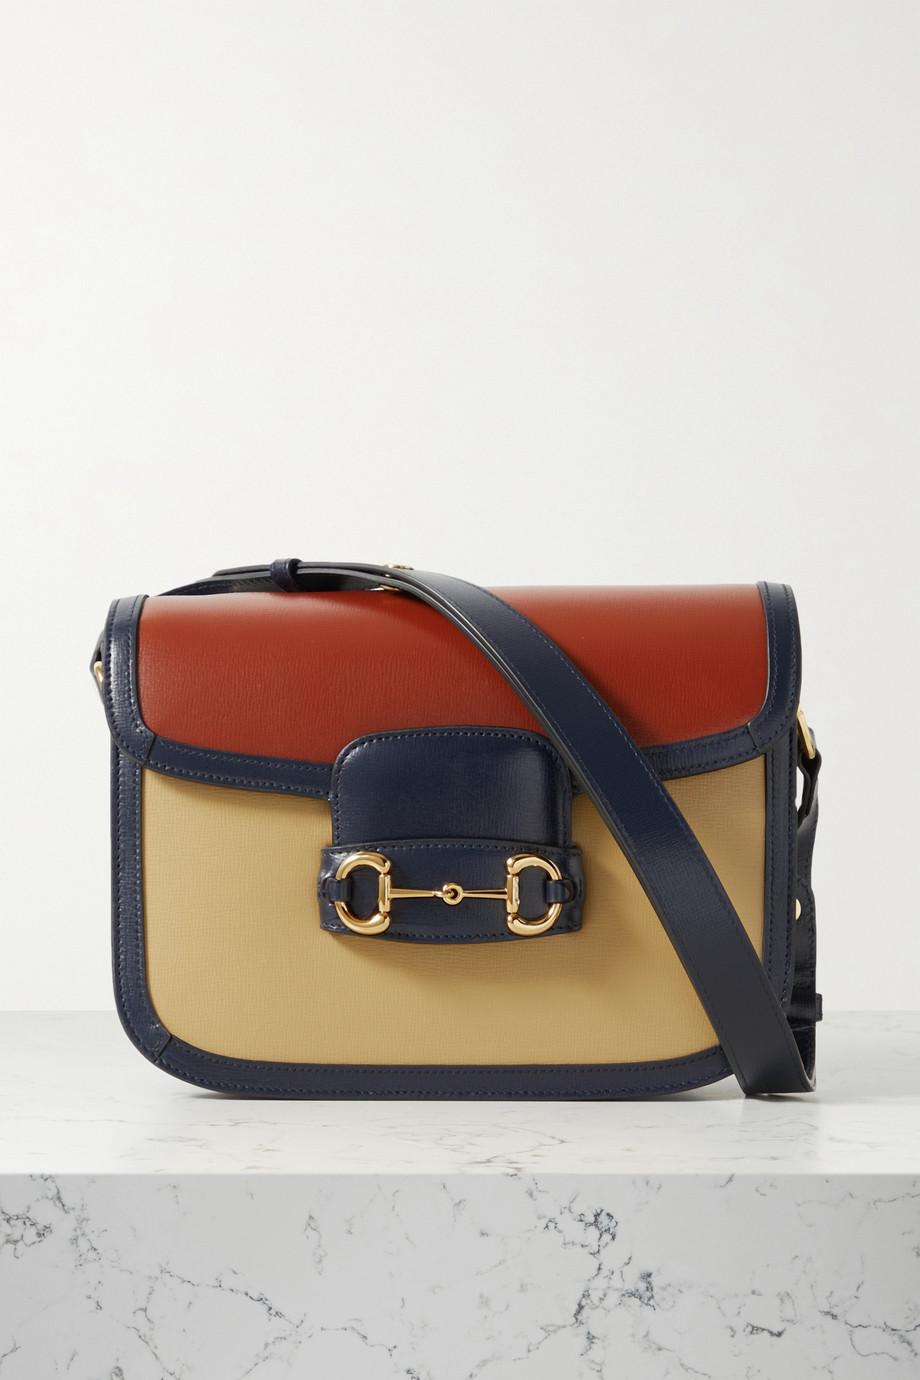 Gucci Sac porté épaule en cuir texturé color-block Horsebit 1955 Medium